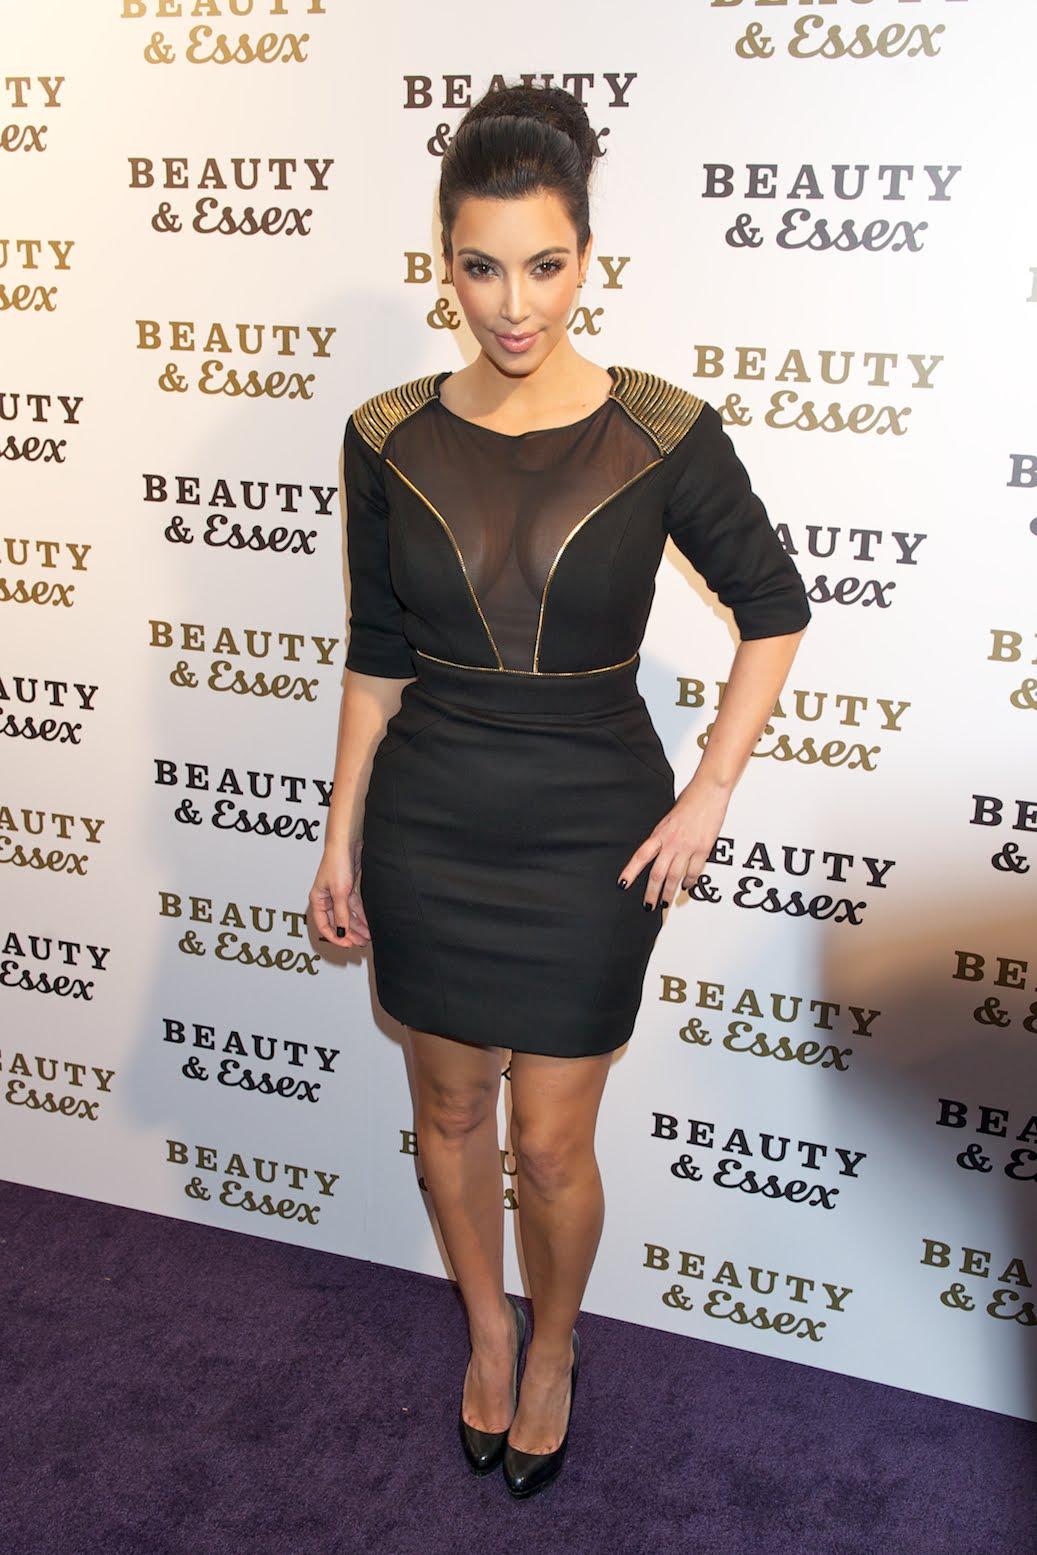 http://3.bp.blogspot.com/__dSMljhXGag/TQQSrG6EaWI/AAAAAAAAGGk/qduGQS3rS_E/s1600/Kim-Kardashian-162.jpg